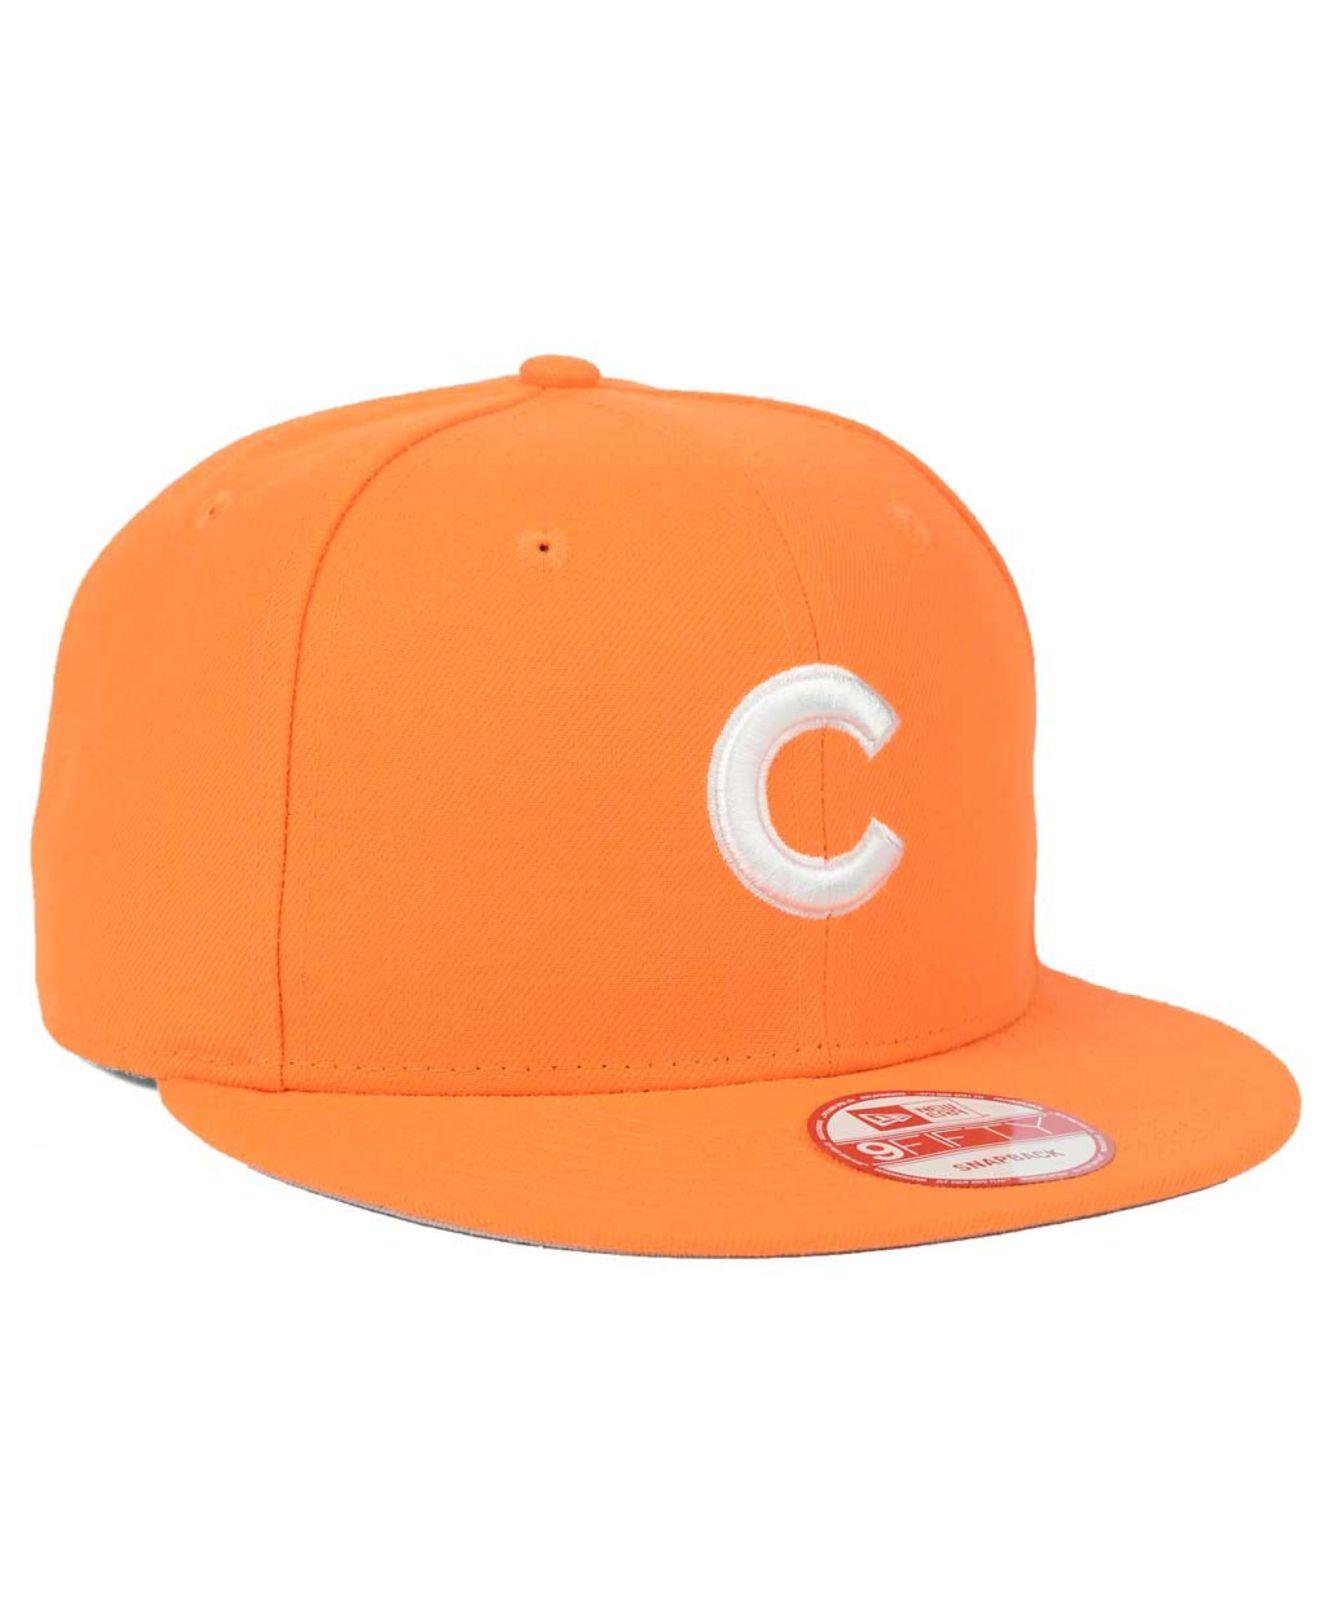 brand new 8adb0 82b1e ... spain lyst ktz chicago cubs c dub 9fifty snapback cap in orange 0deca  3f03c